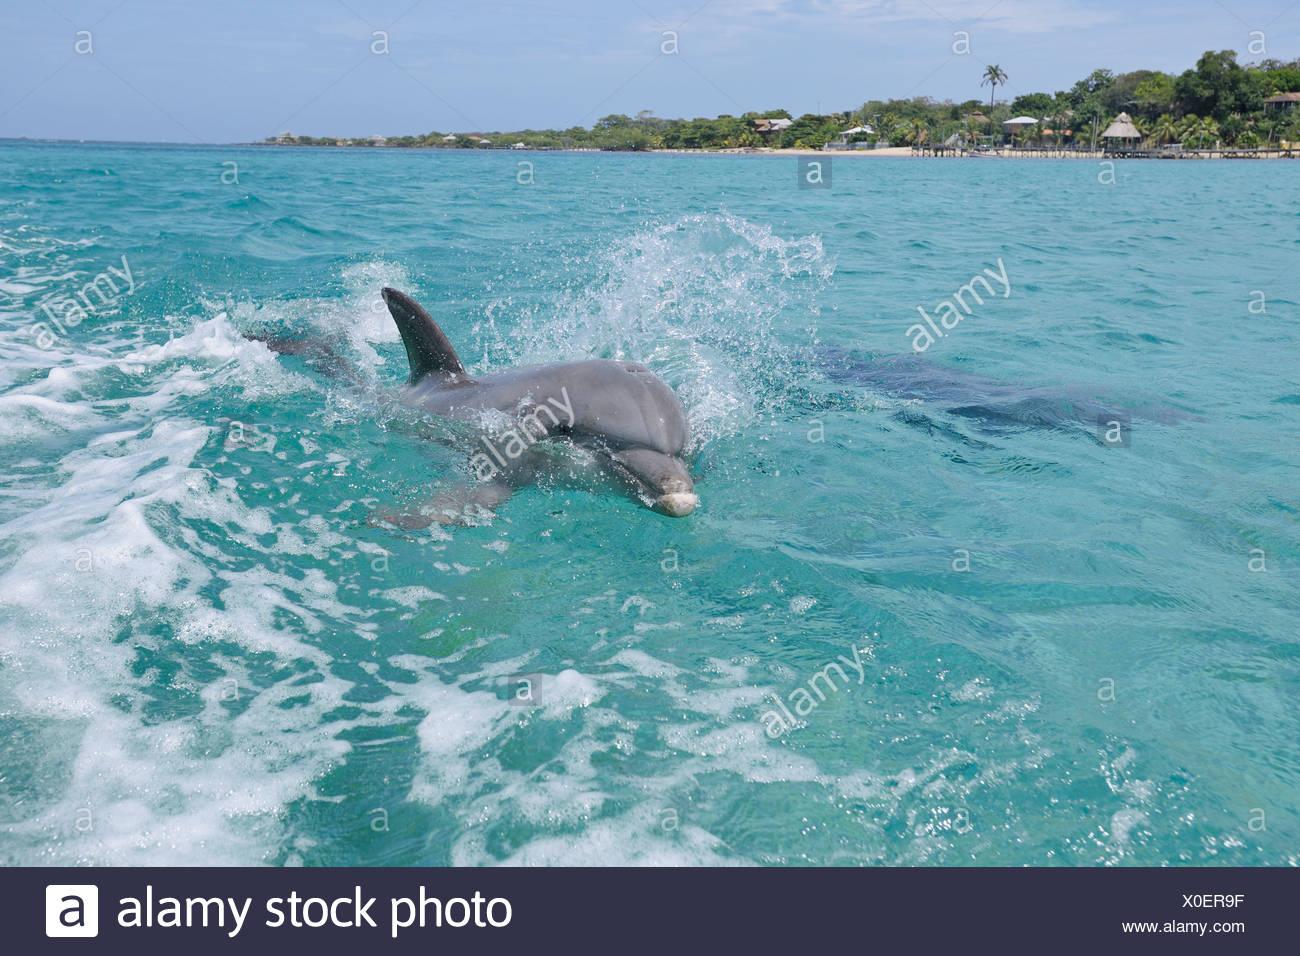 Latin America, Honduras, Bay Islands Department, Roatan, Caribbean Sea, Two bottlenose dolphins swimming in seawater surface Stock Photo